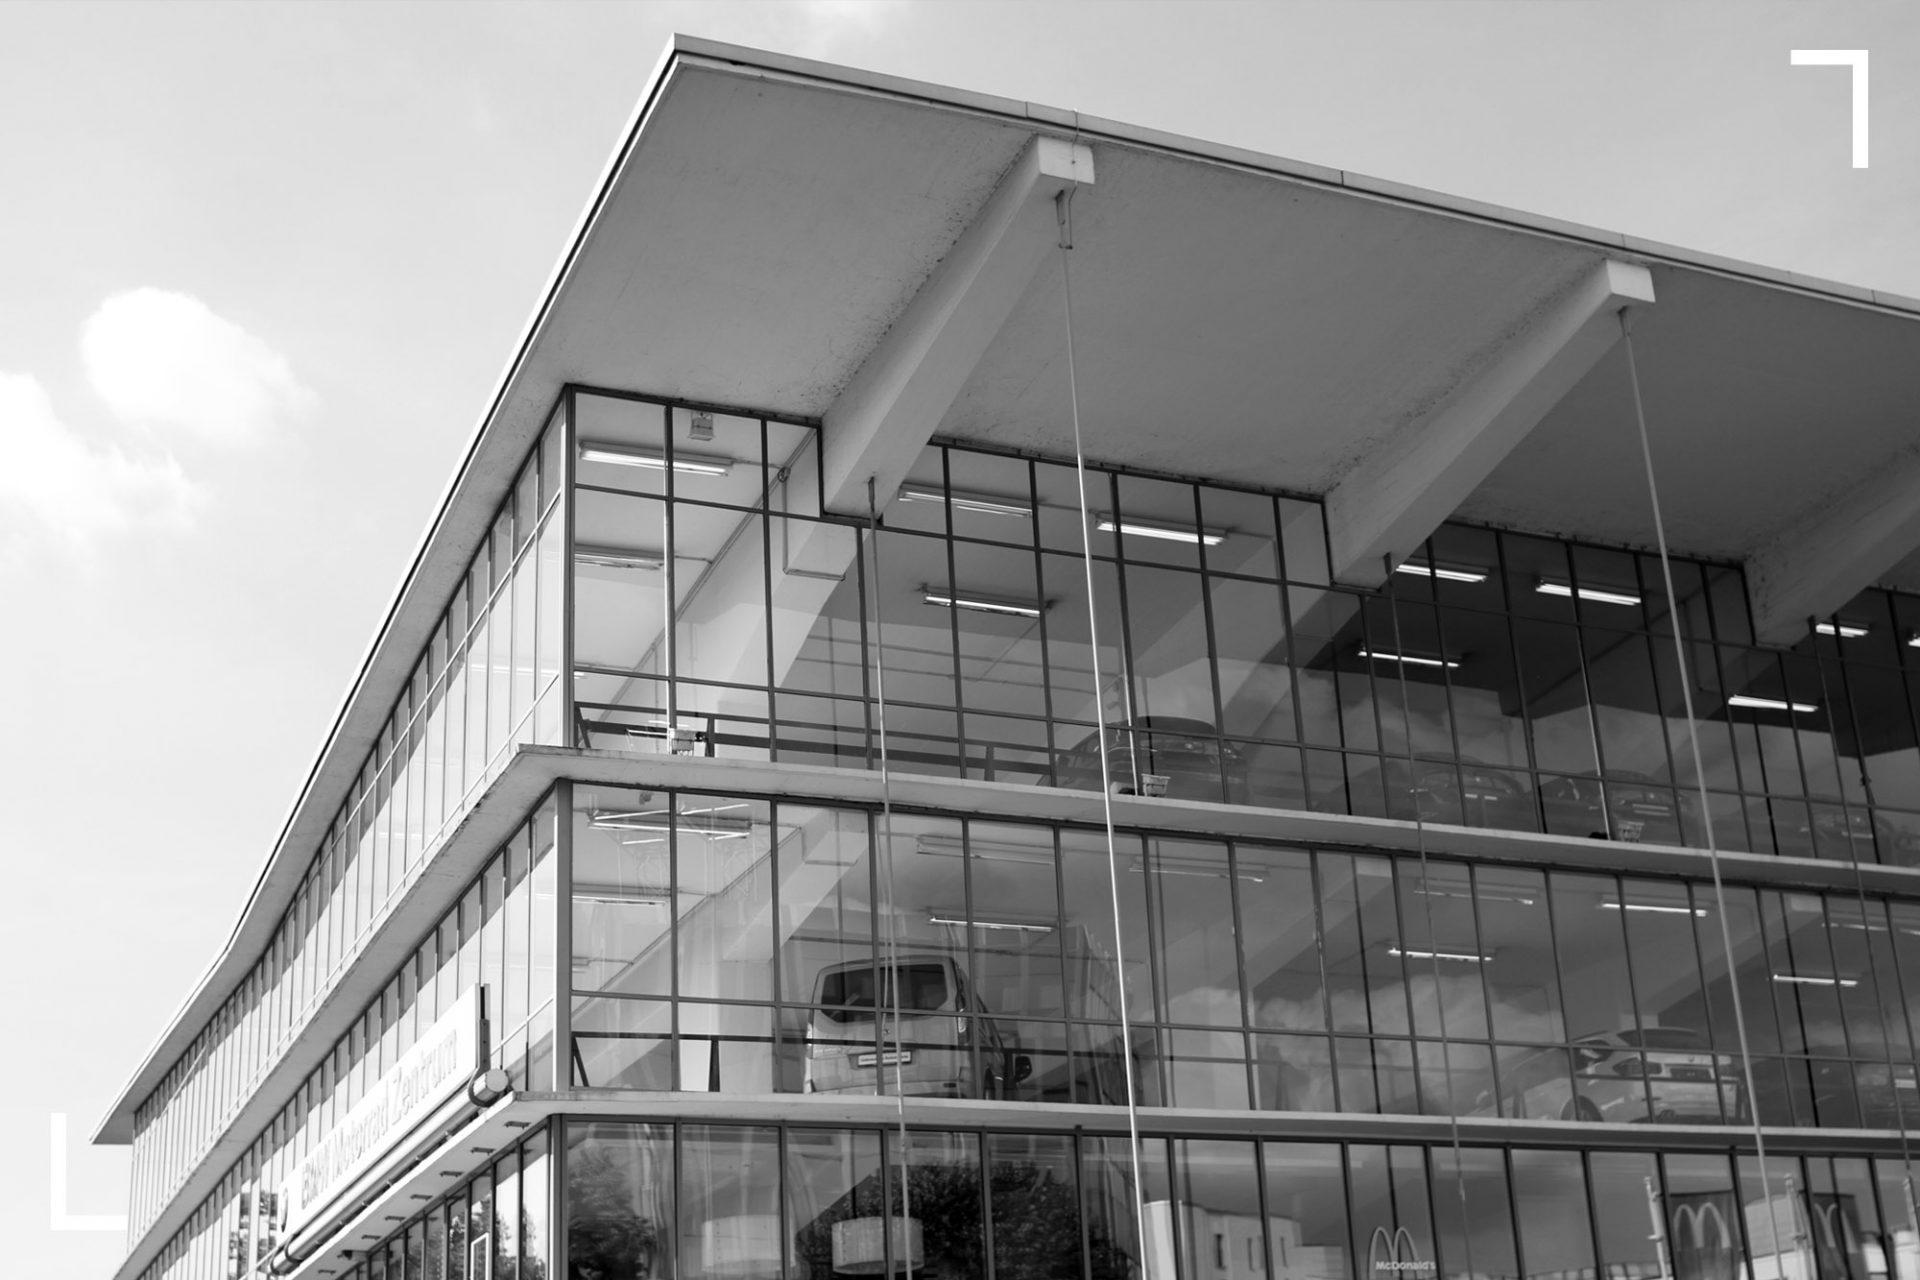 THE LINK to #urbanana: Haniel-Garage